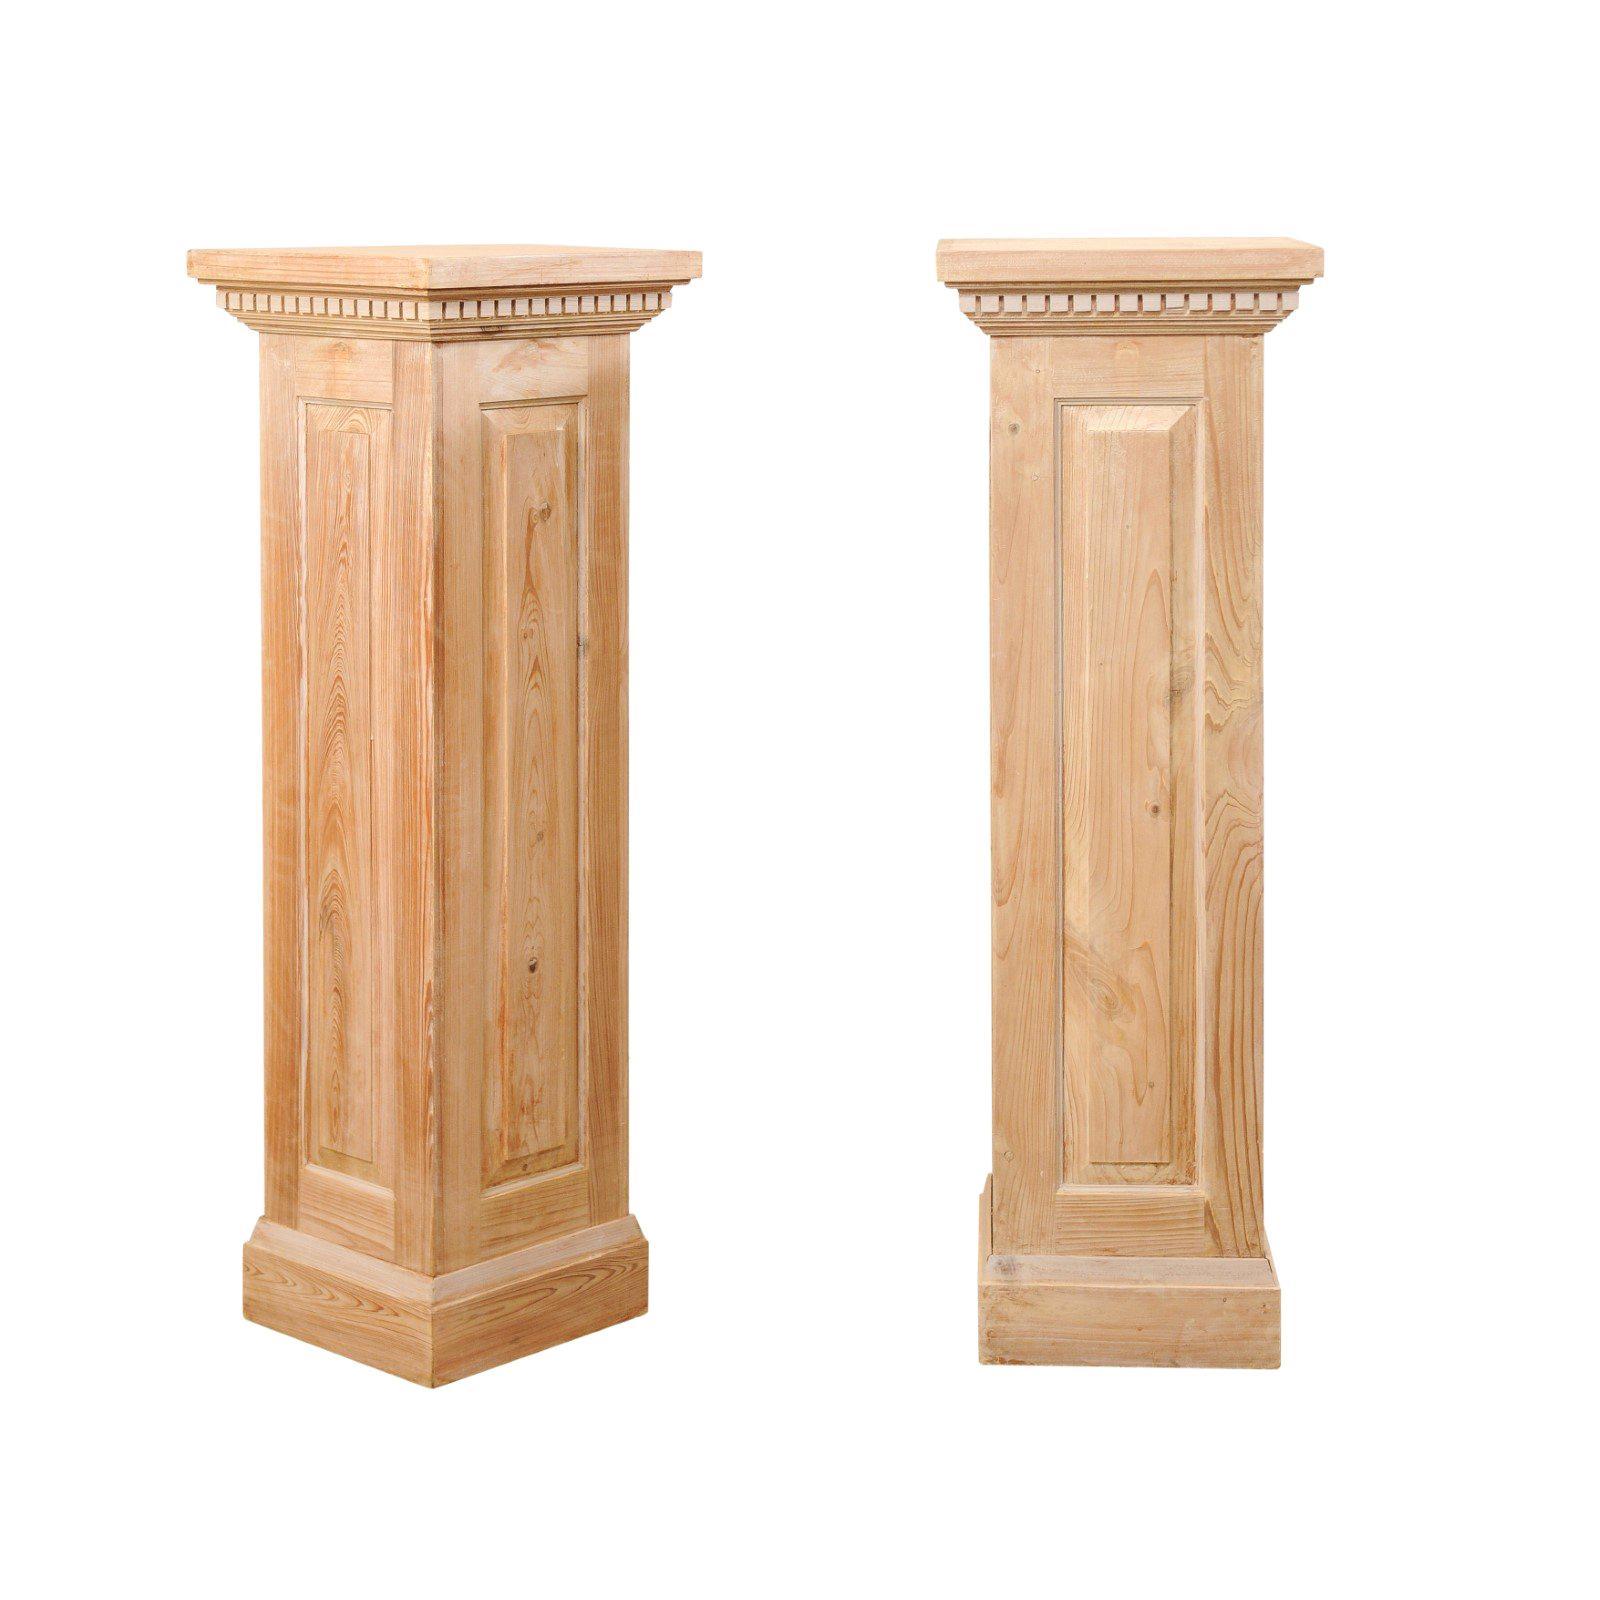 Pair of Carved Wood Squared Pedestal Columns